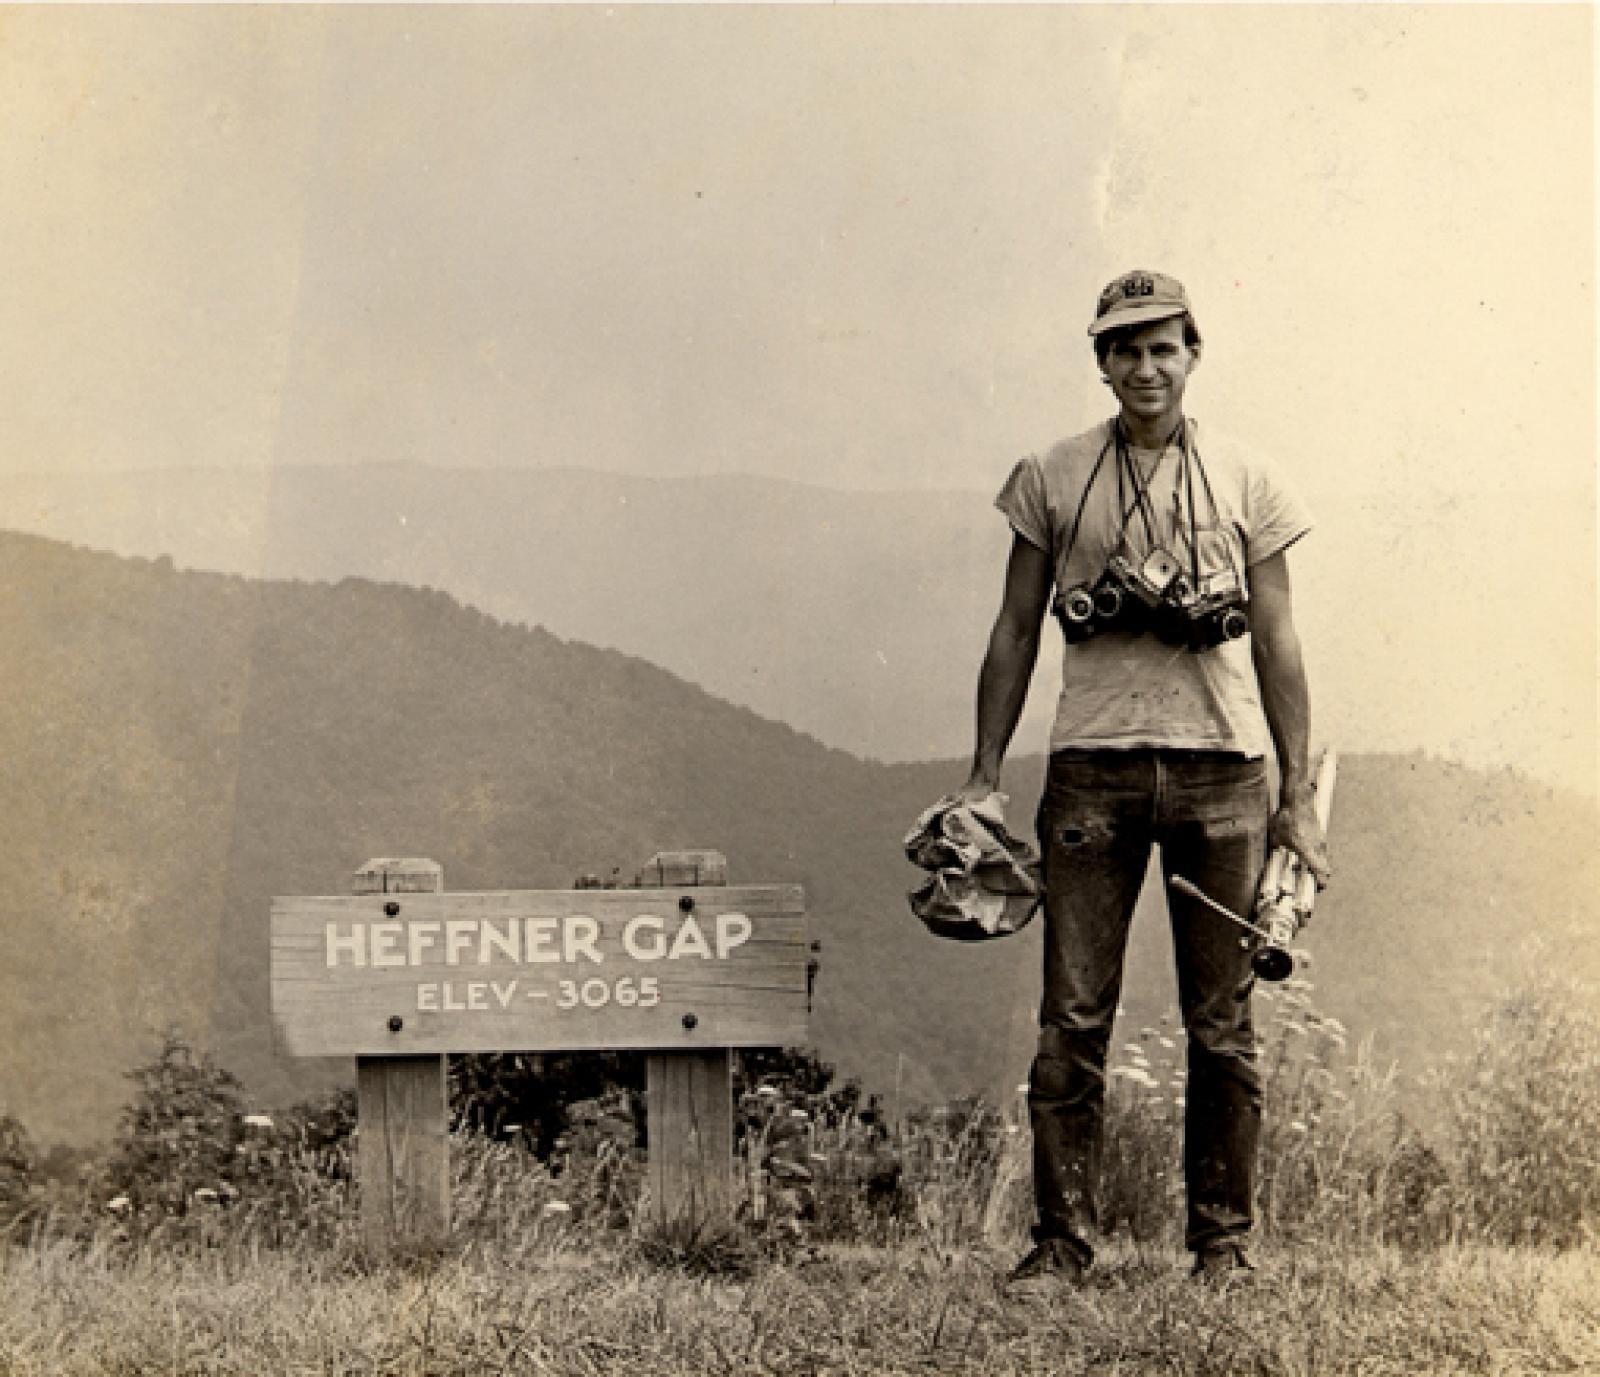 [ Fig. 02 ] Photograph of Donigan Cumming at Heffner Gap, North Carolina. Around: 1968. Photo: Robert Forsythe.